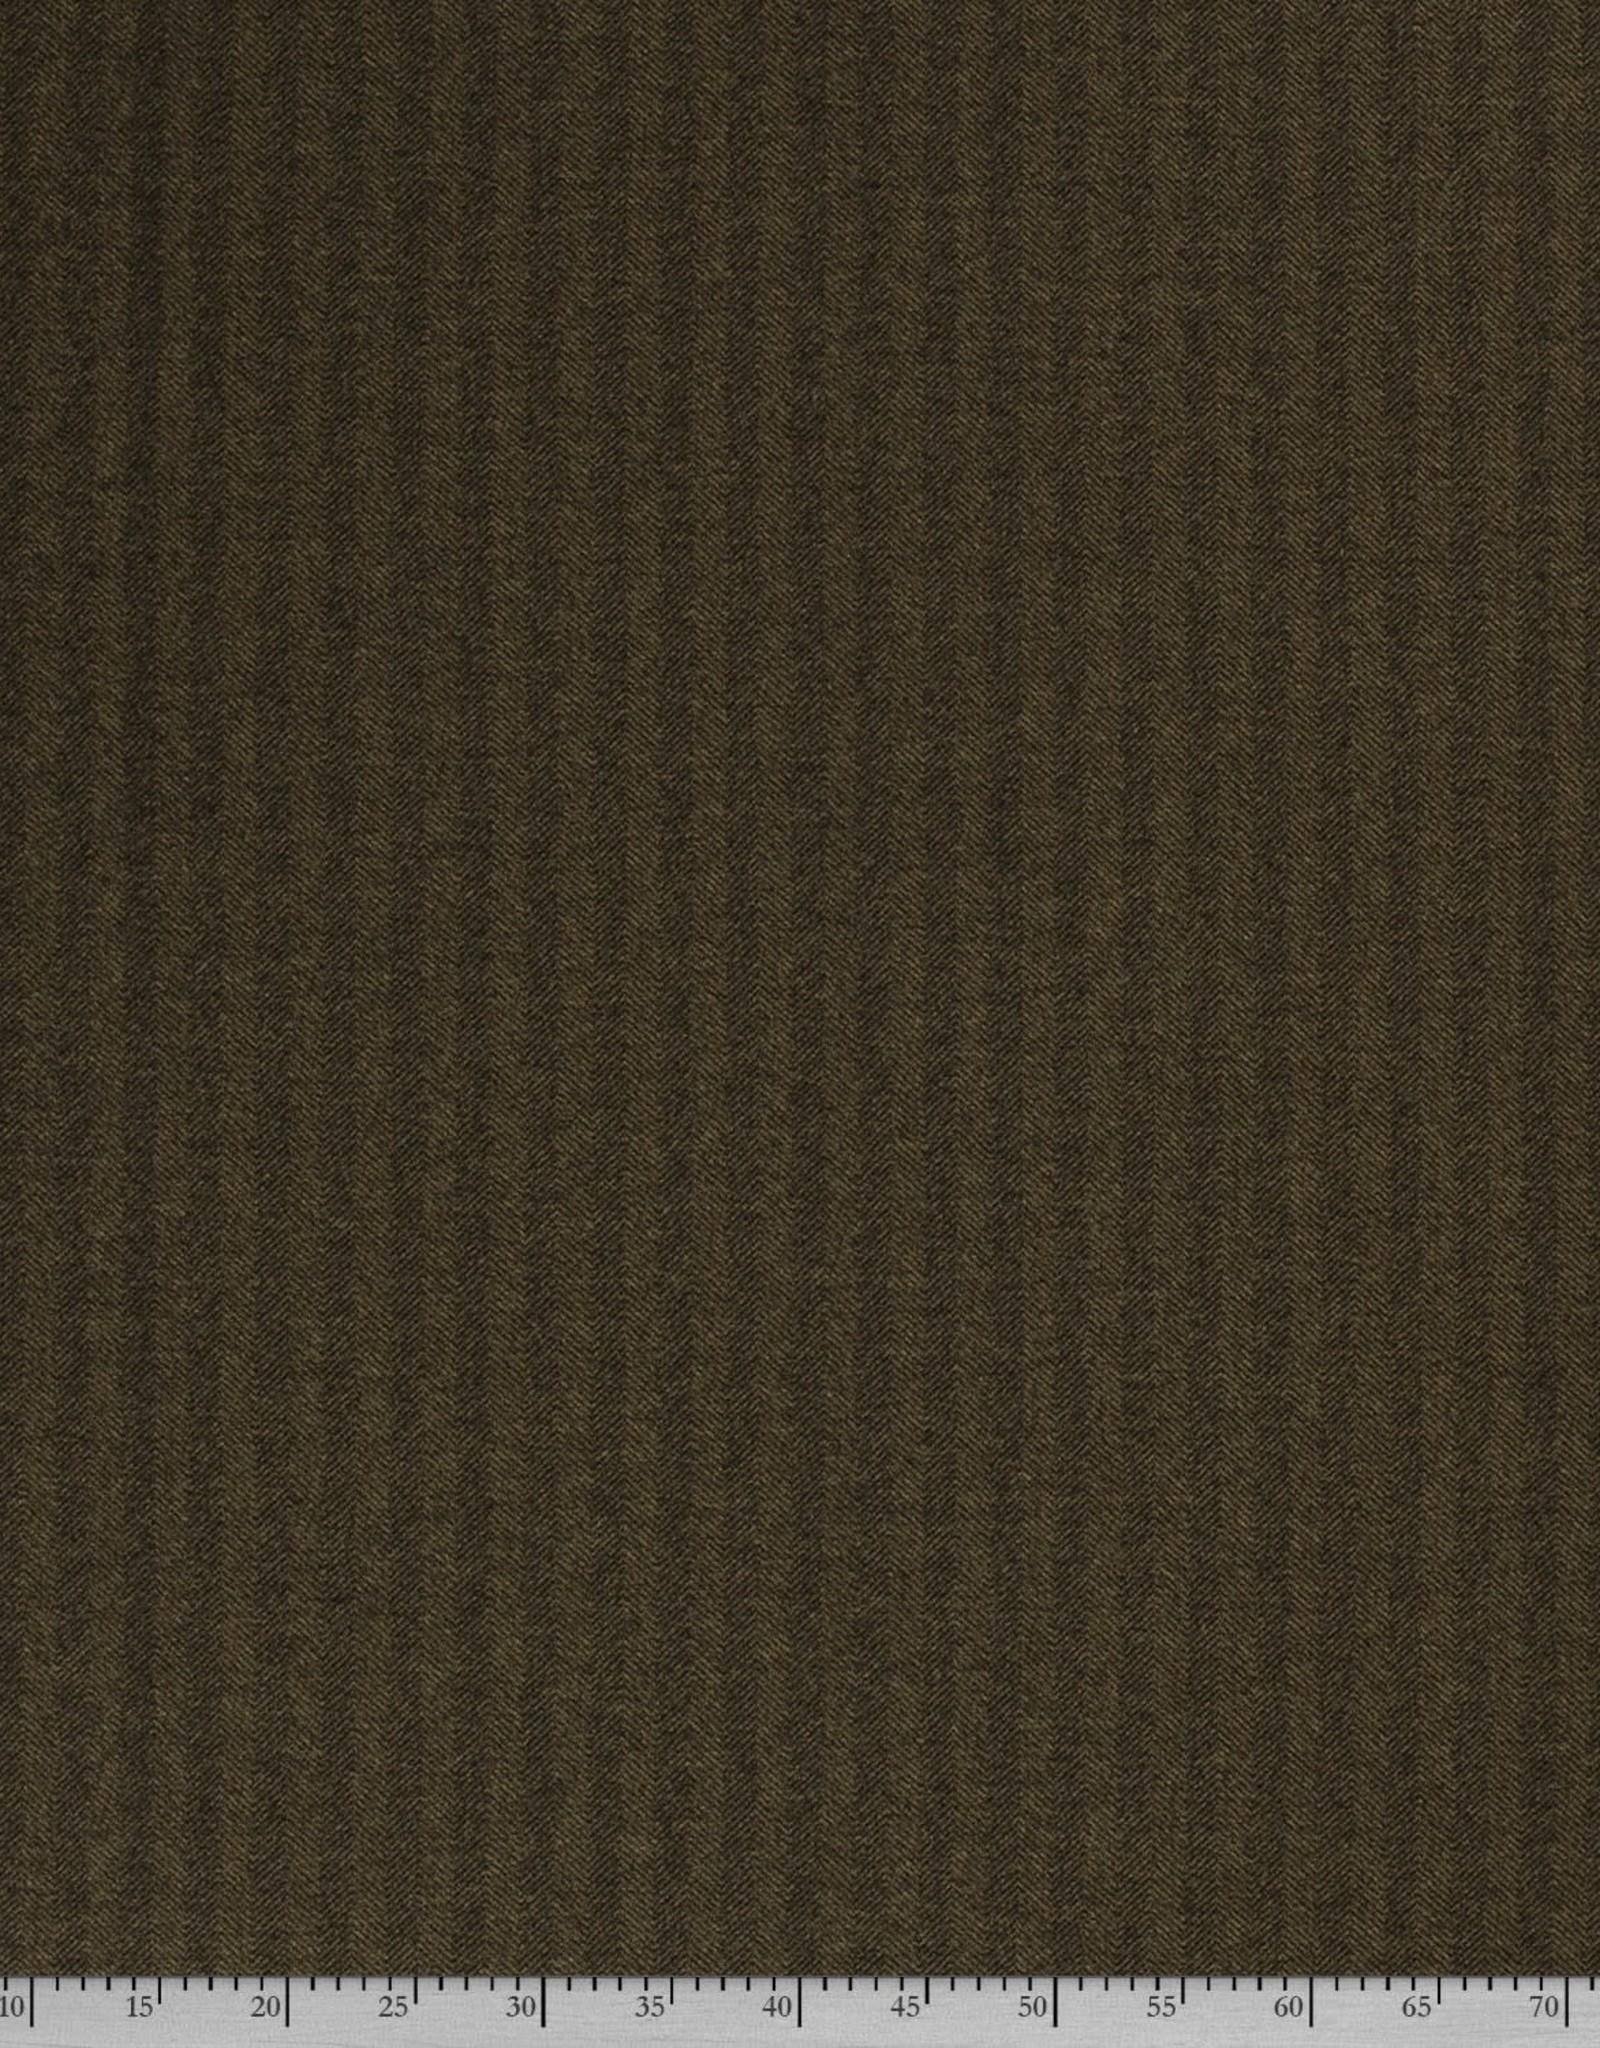 Jacquard visgraat groen